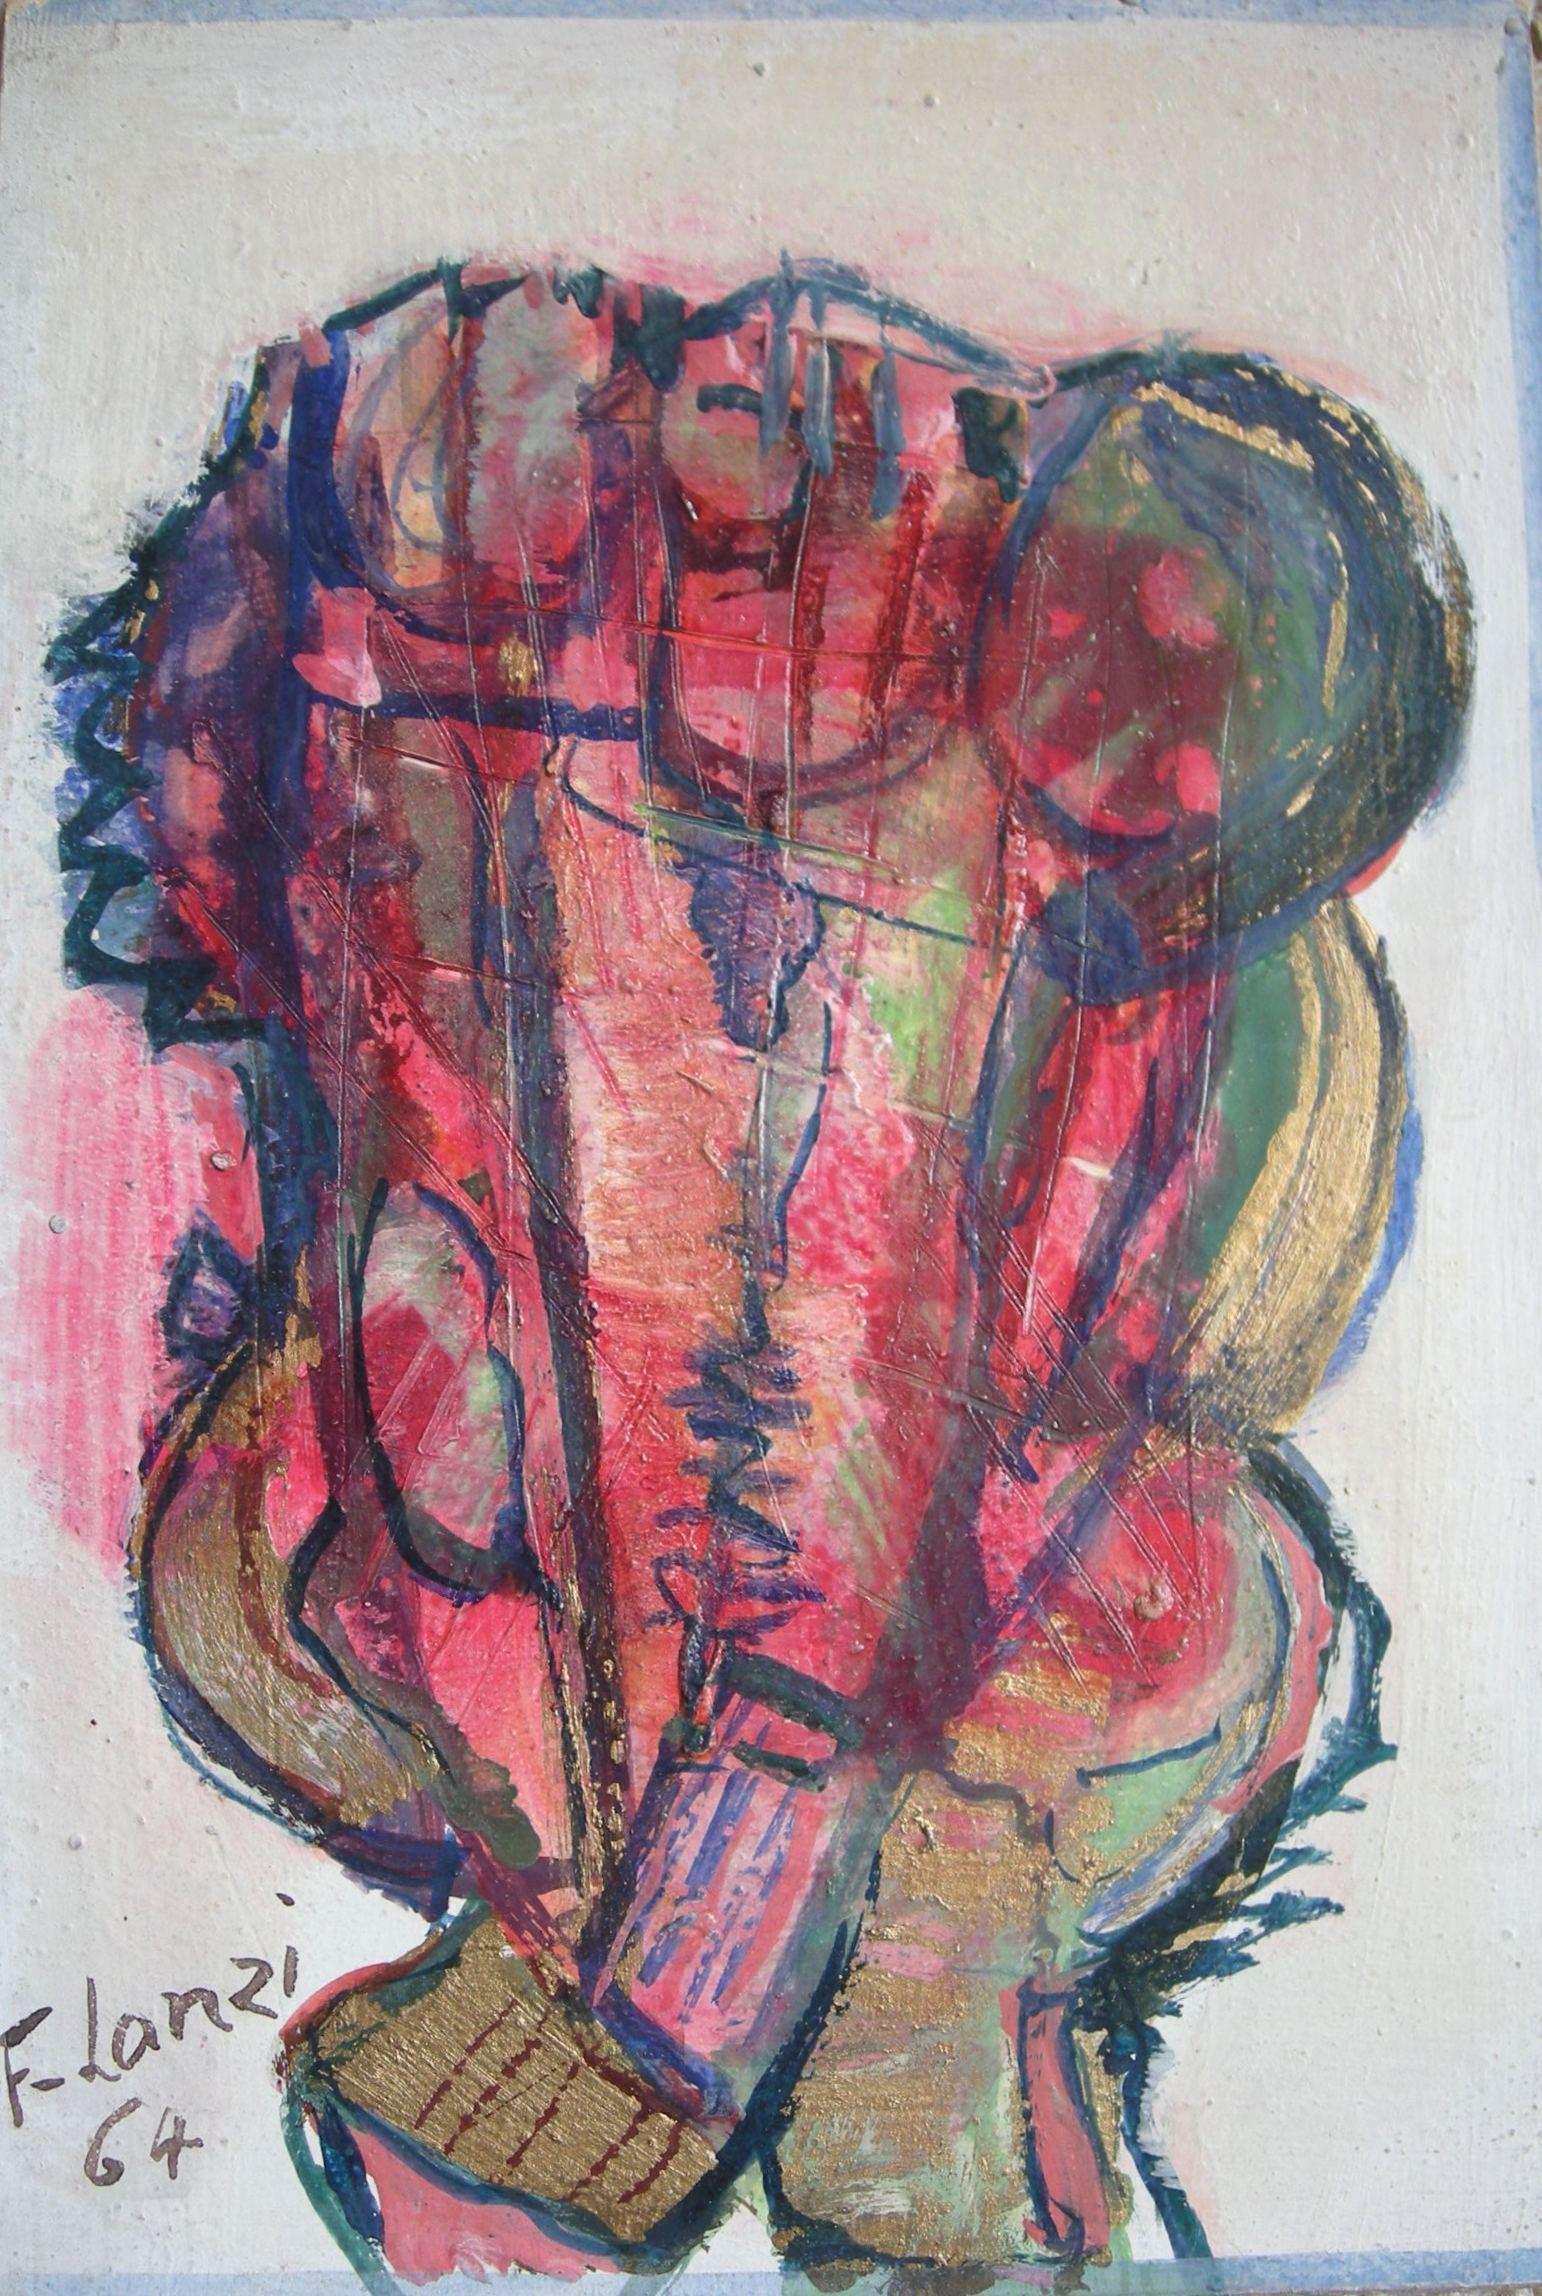 Francois Lanzi - Abstract 1964